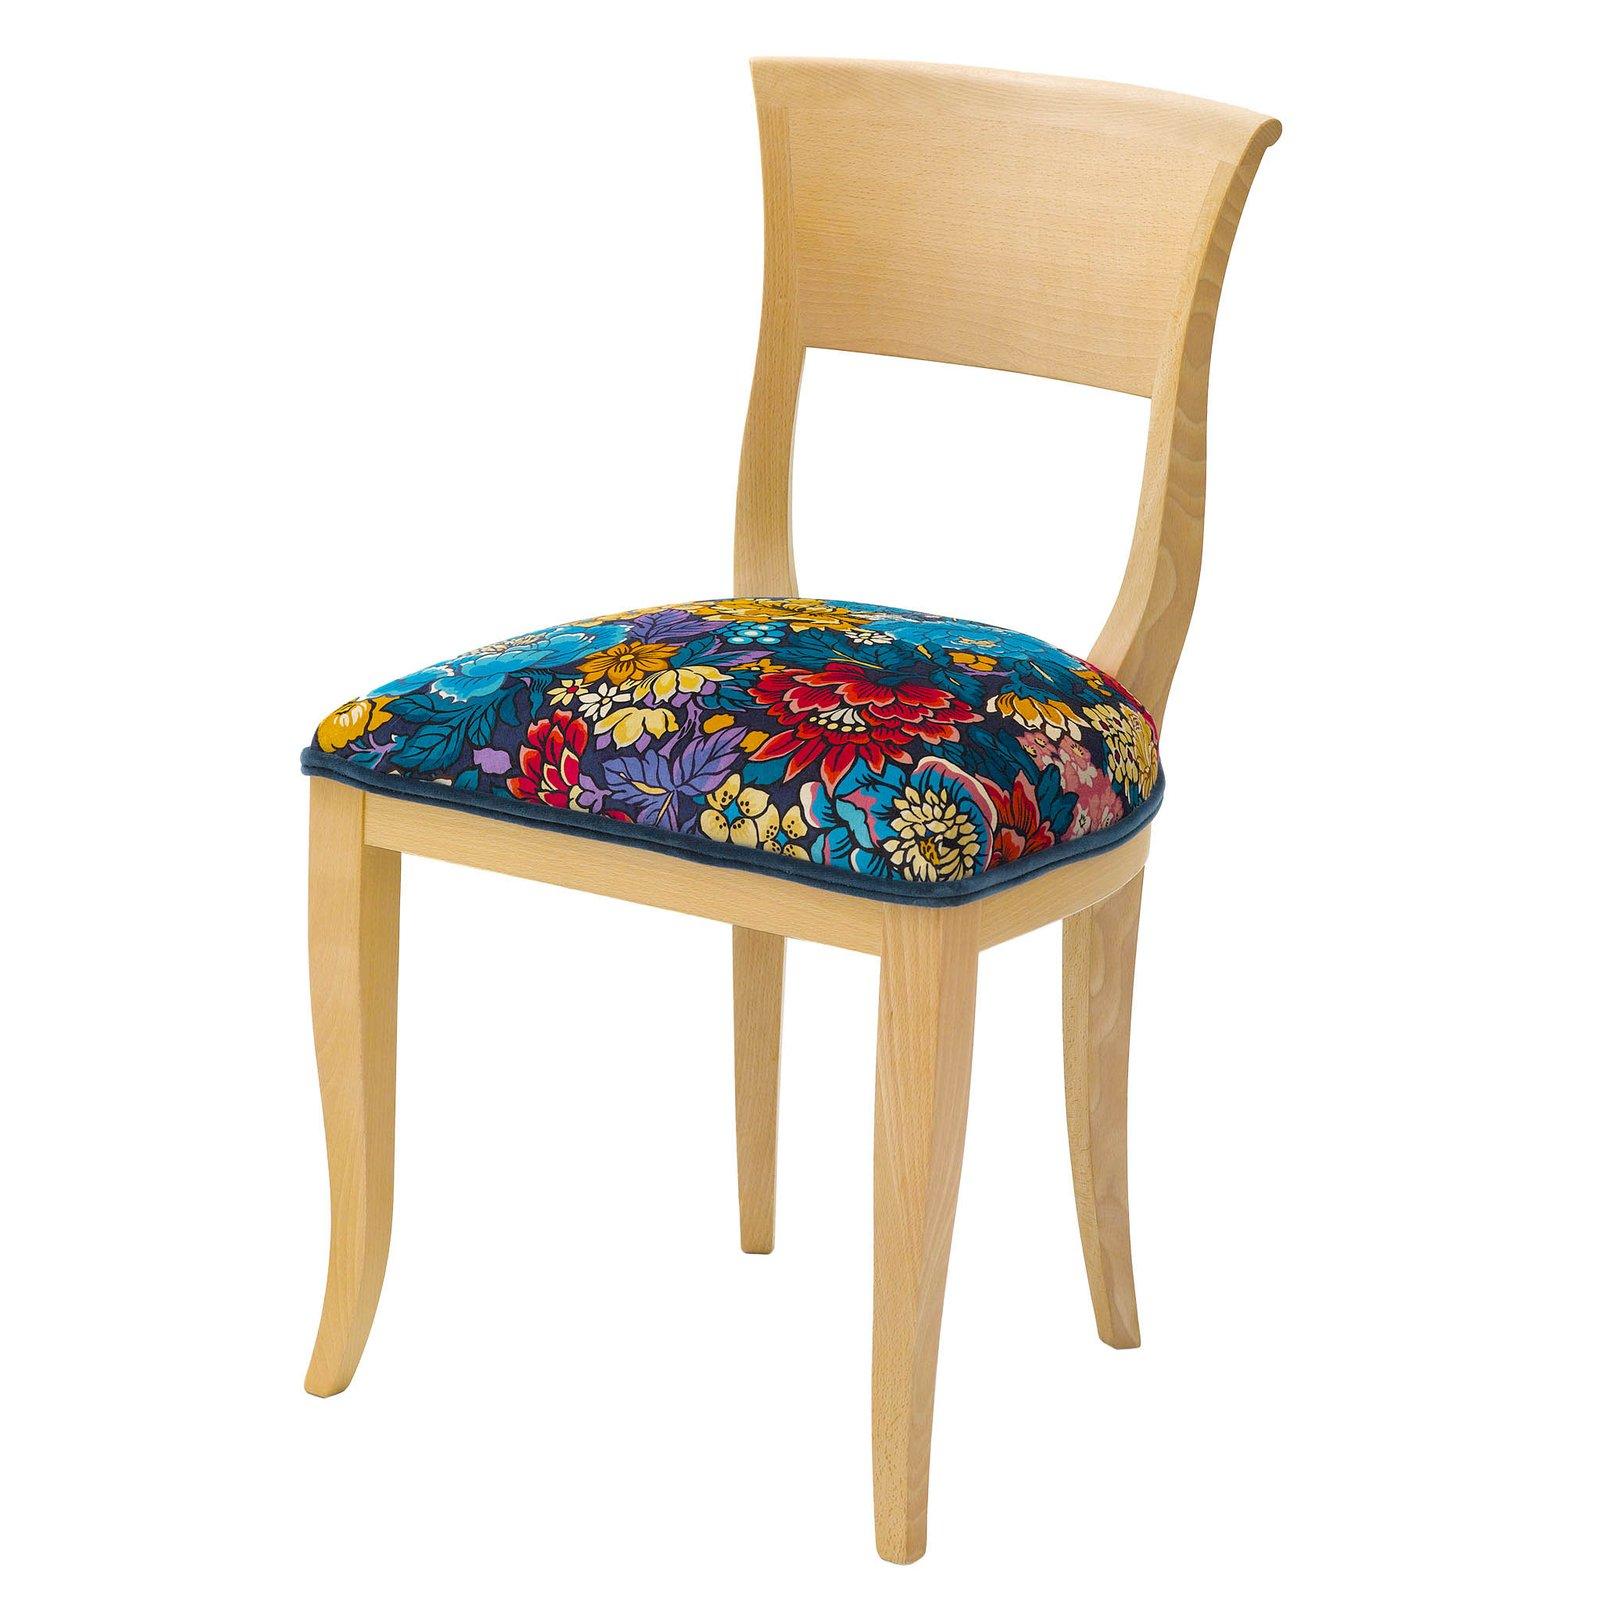 Mid century modern upholstered chair